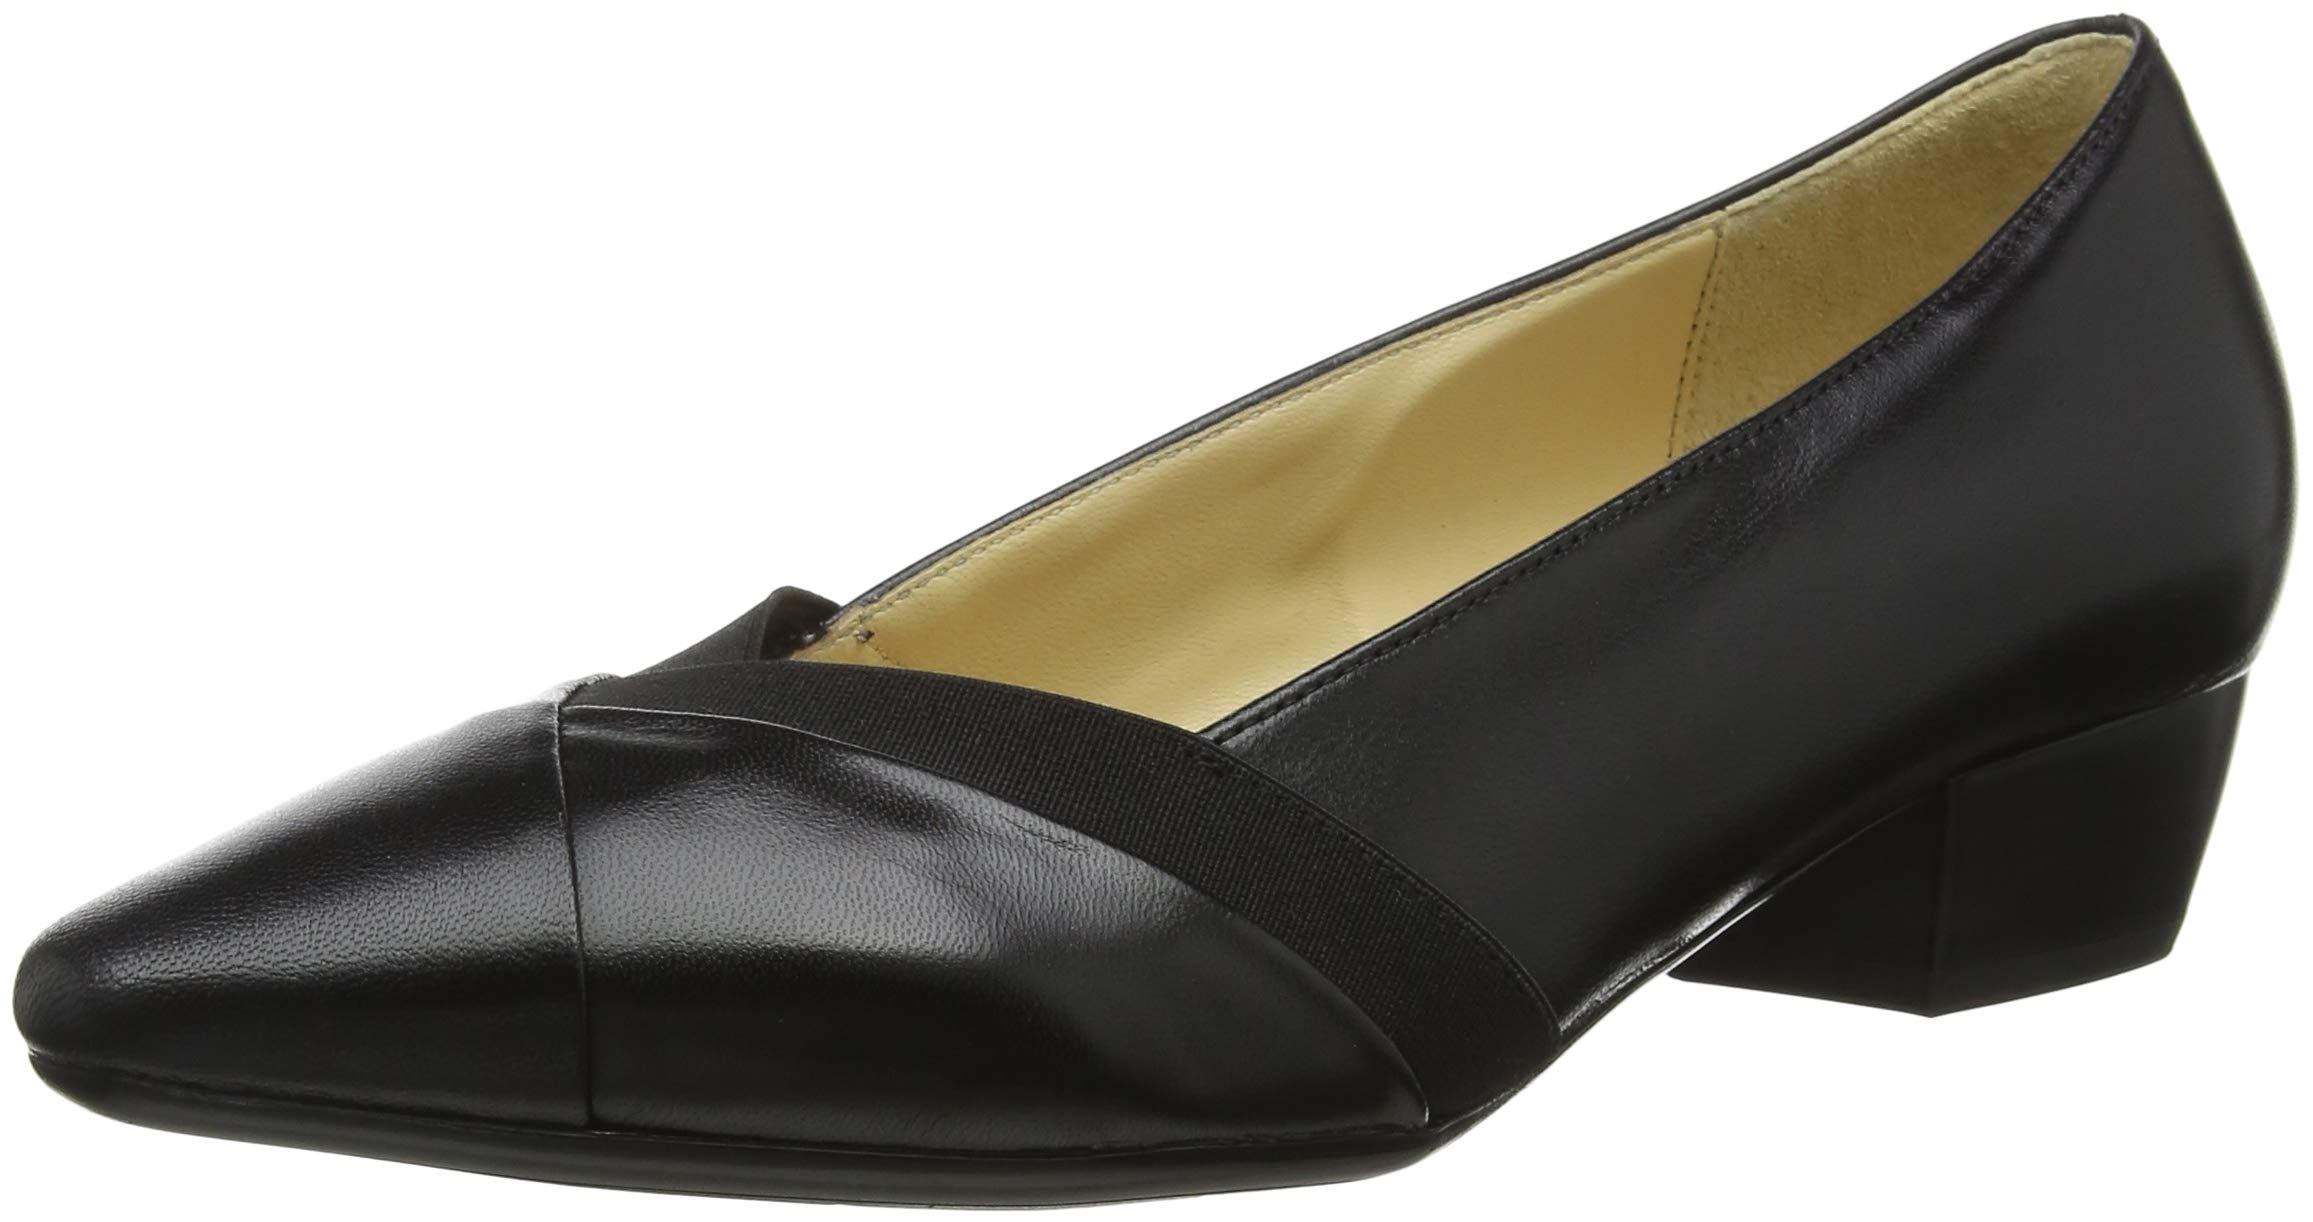 BasicEscarpins 5 Eu 3738 Shoes FemmeNoirschwarz Gabor clJTK1F